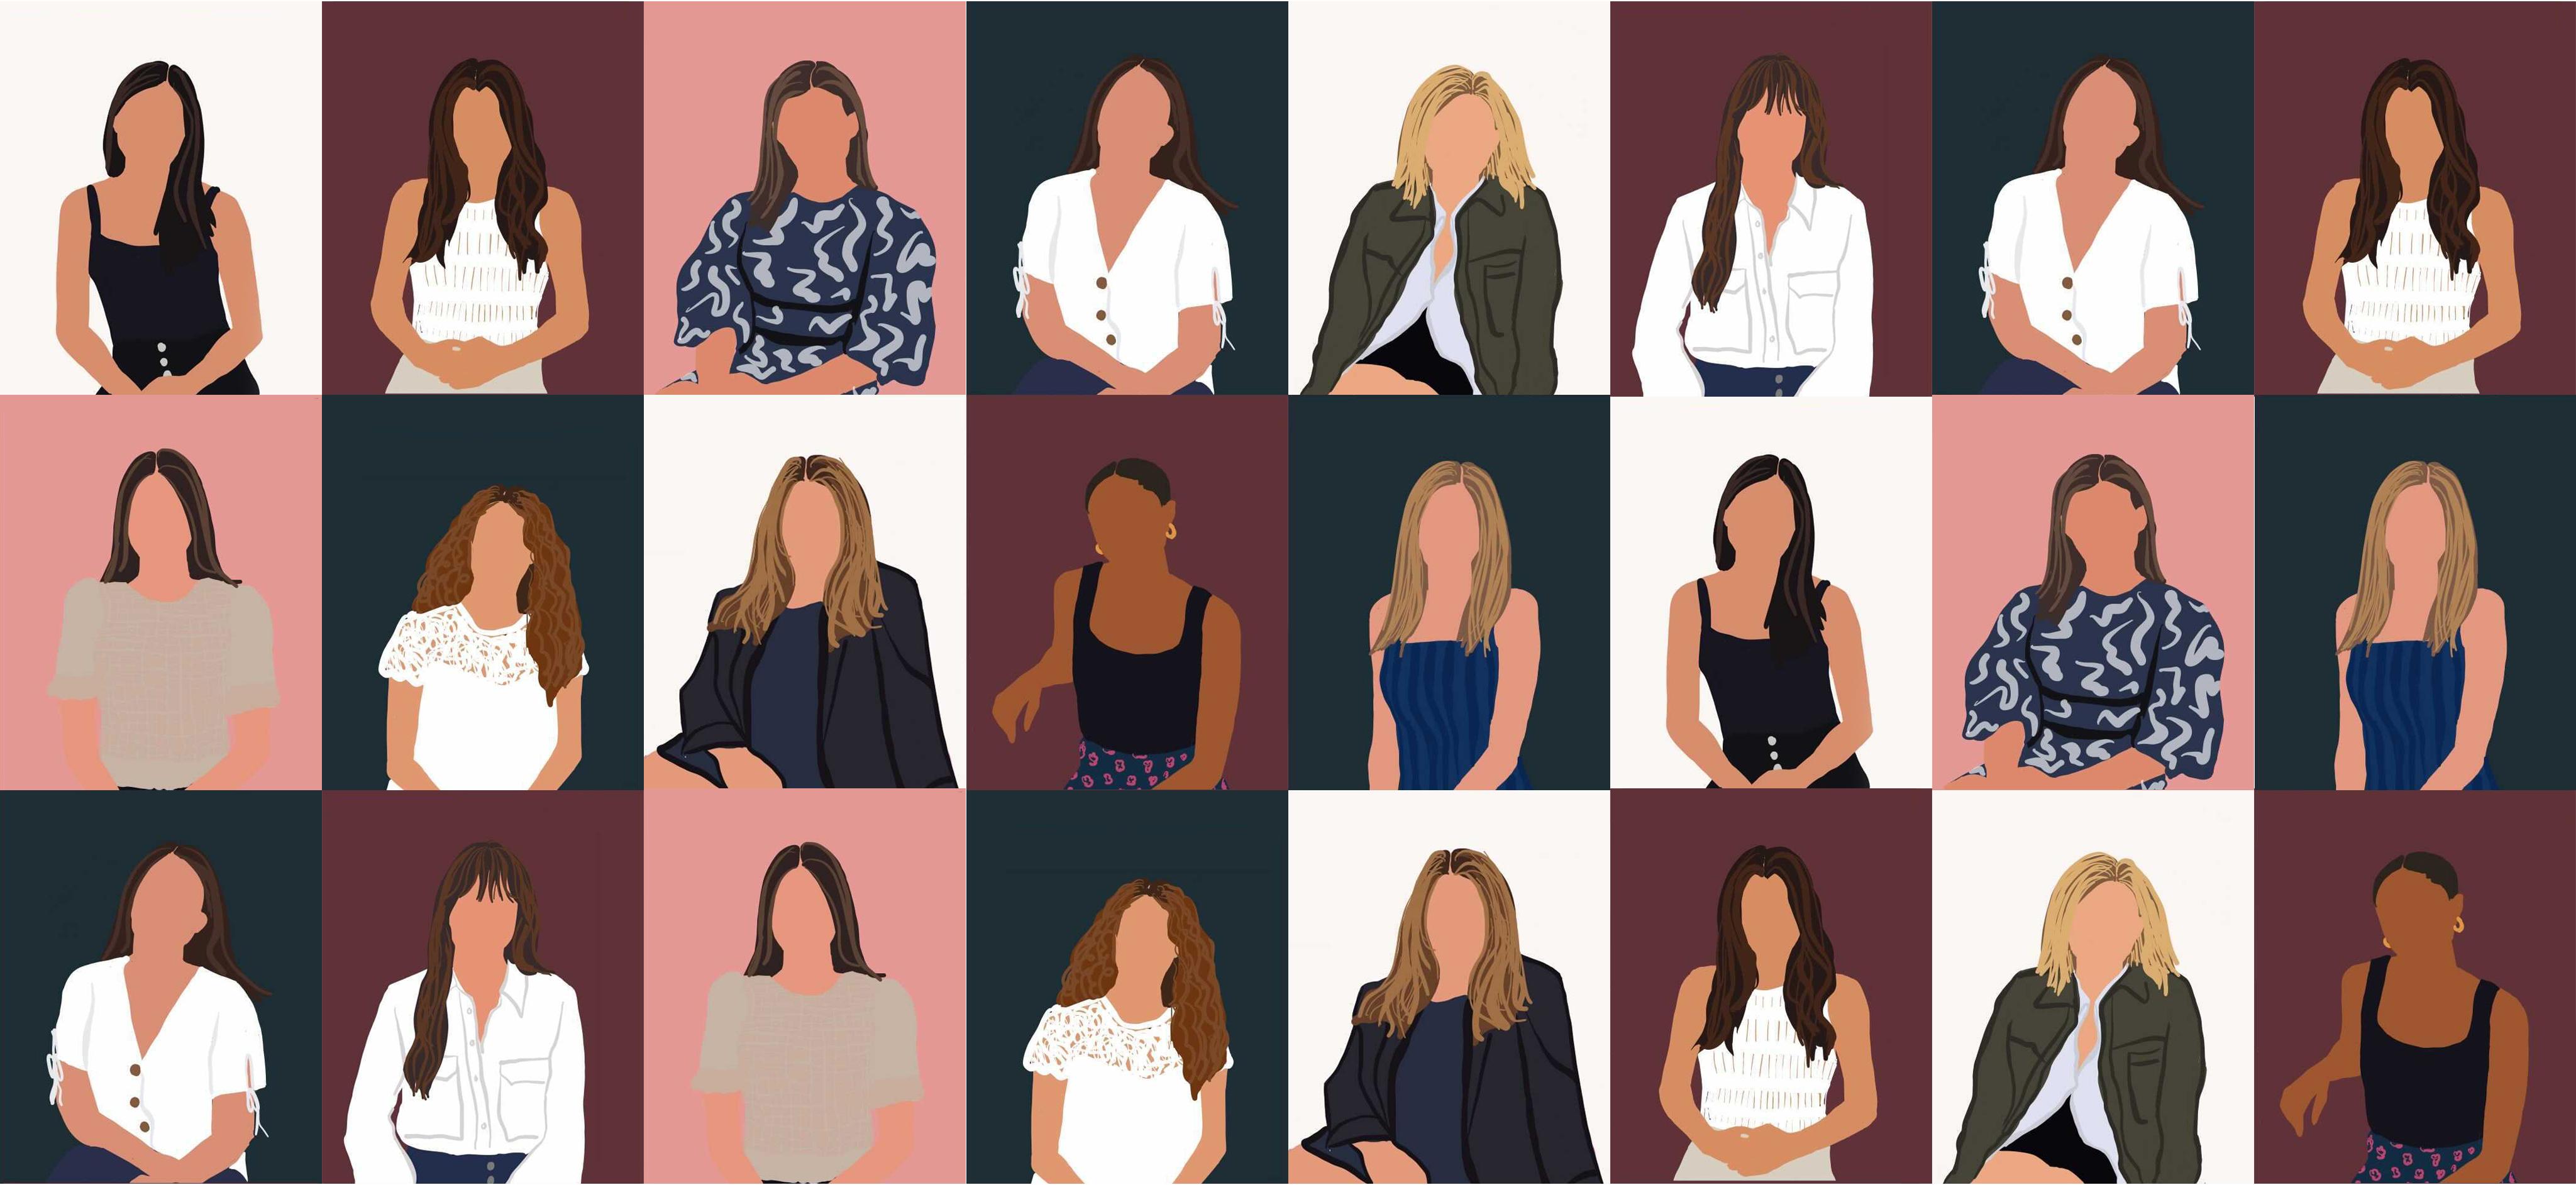 Rebecca Abigail team illustration